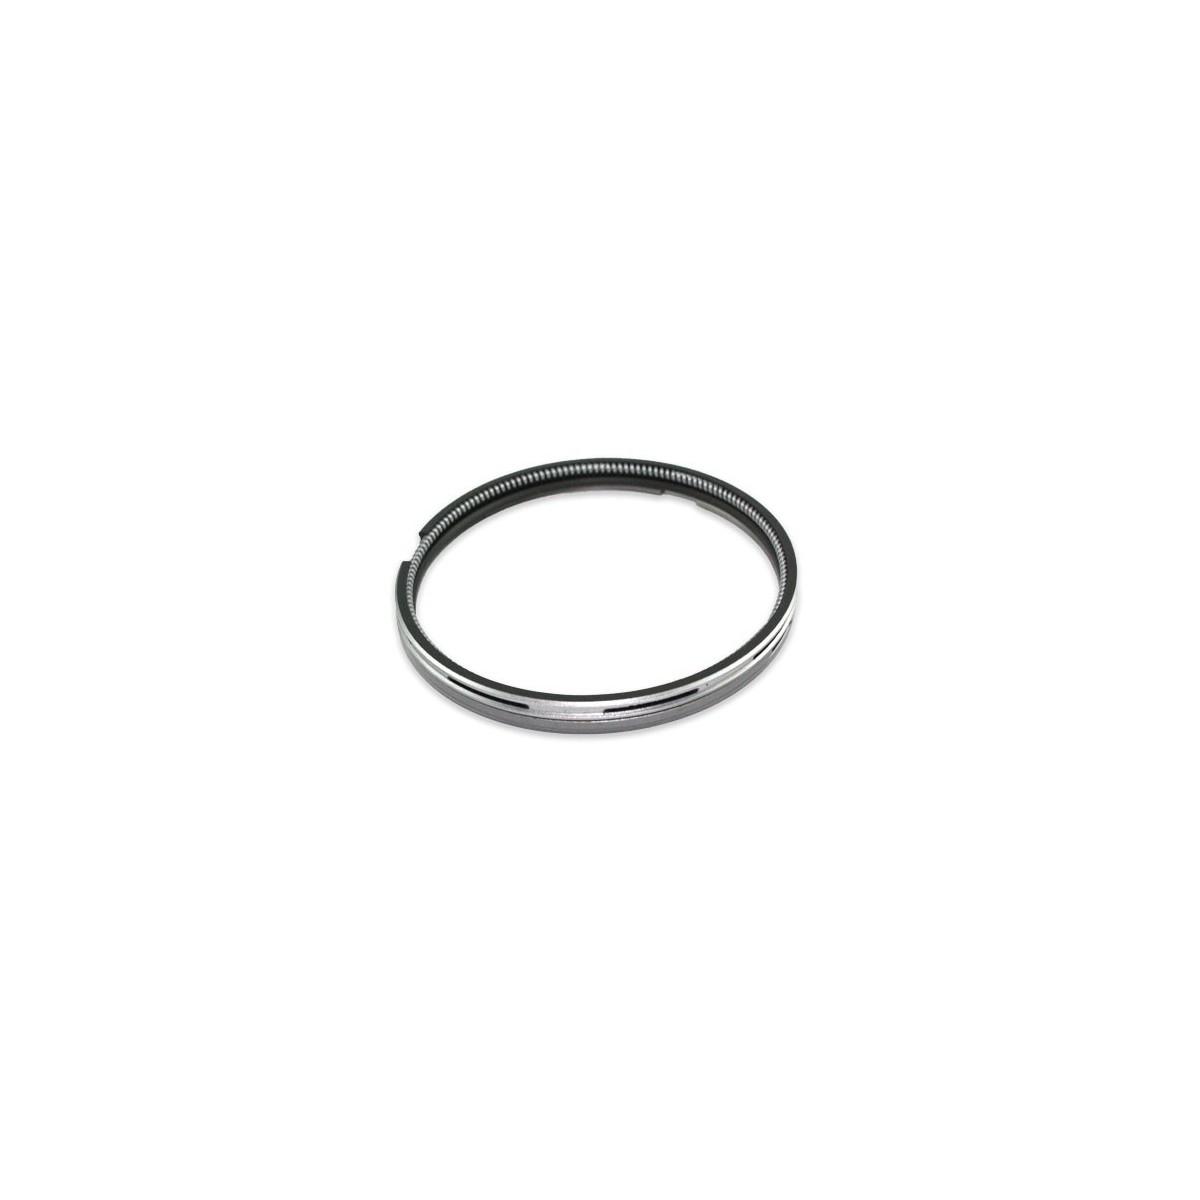 Zestaw pierścieni 82mm Hinomoto N239 82:1.5 x 1.5 x 3 STD